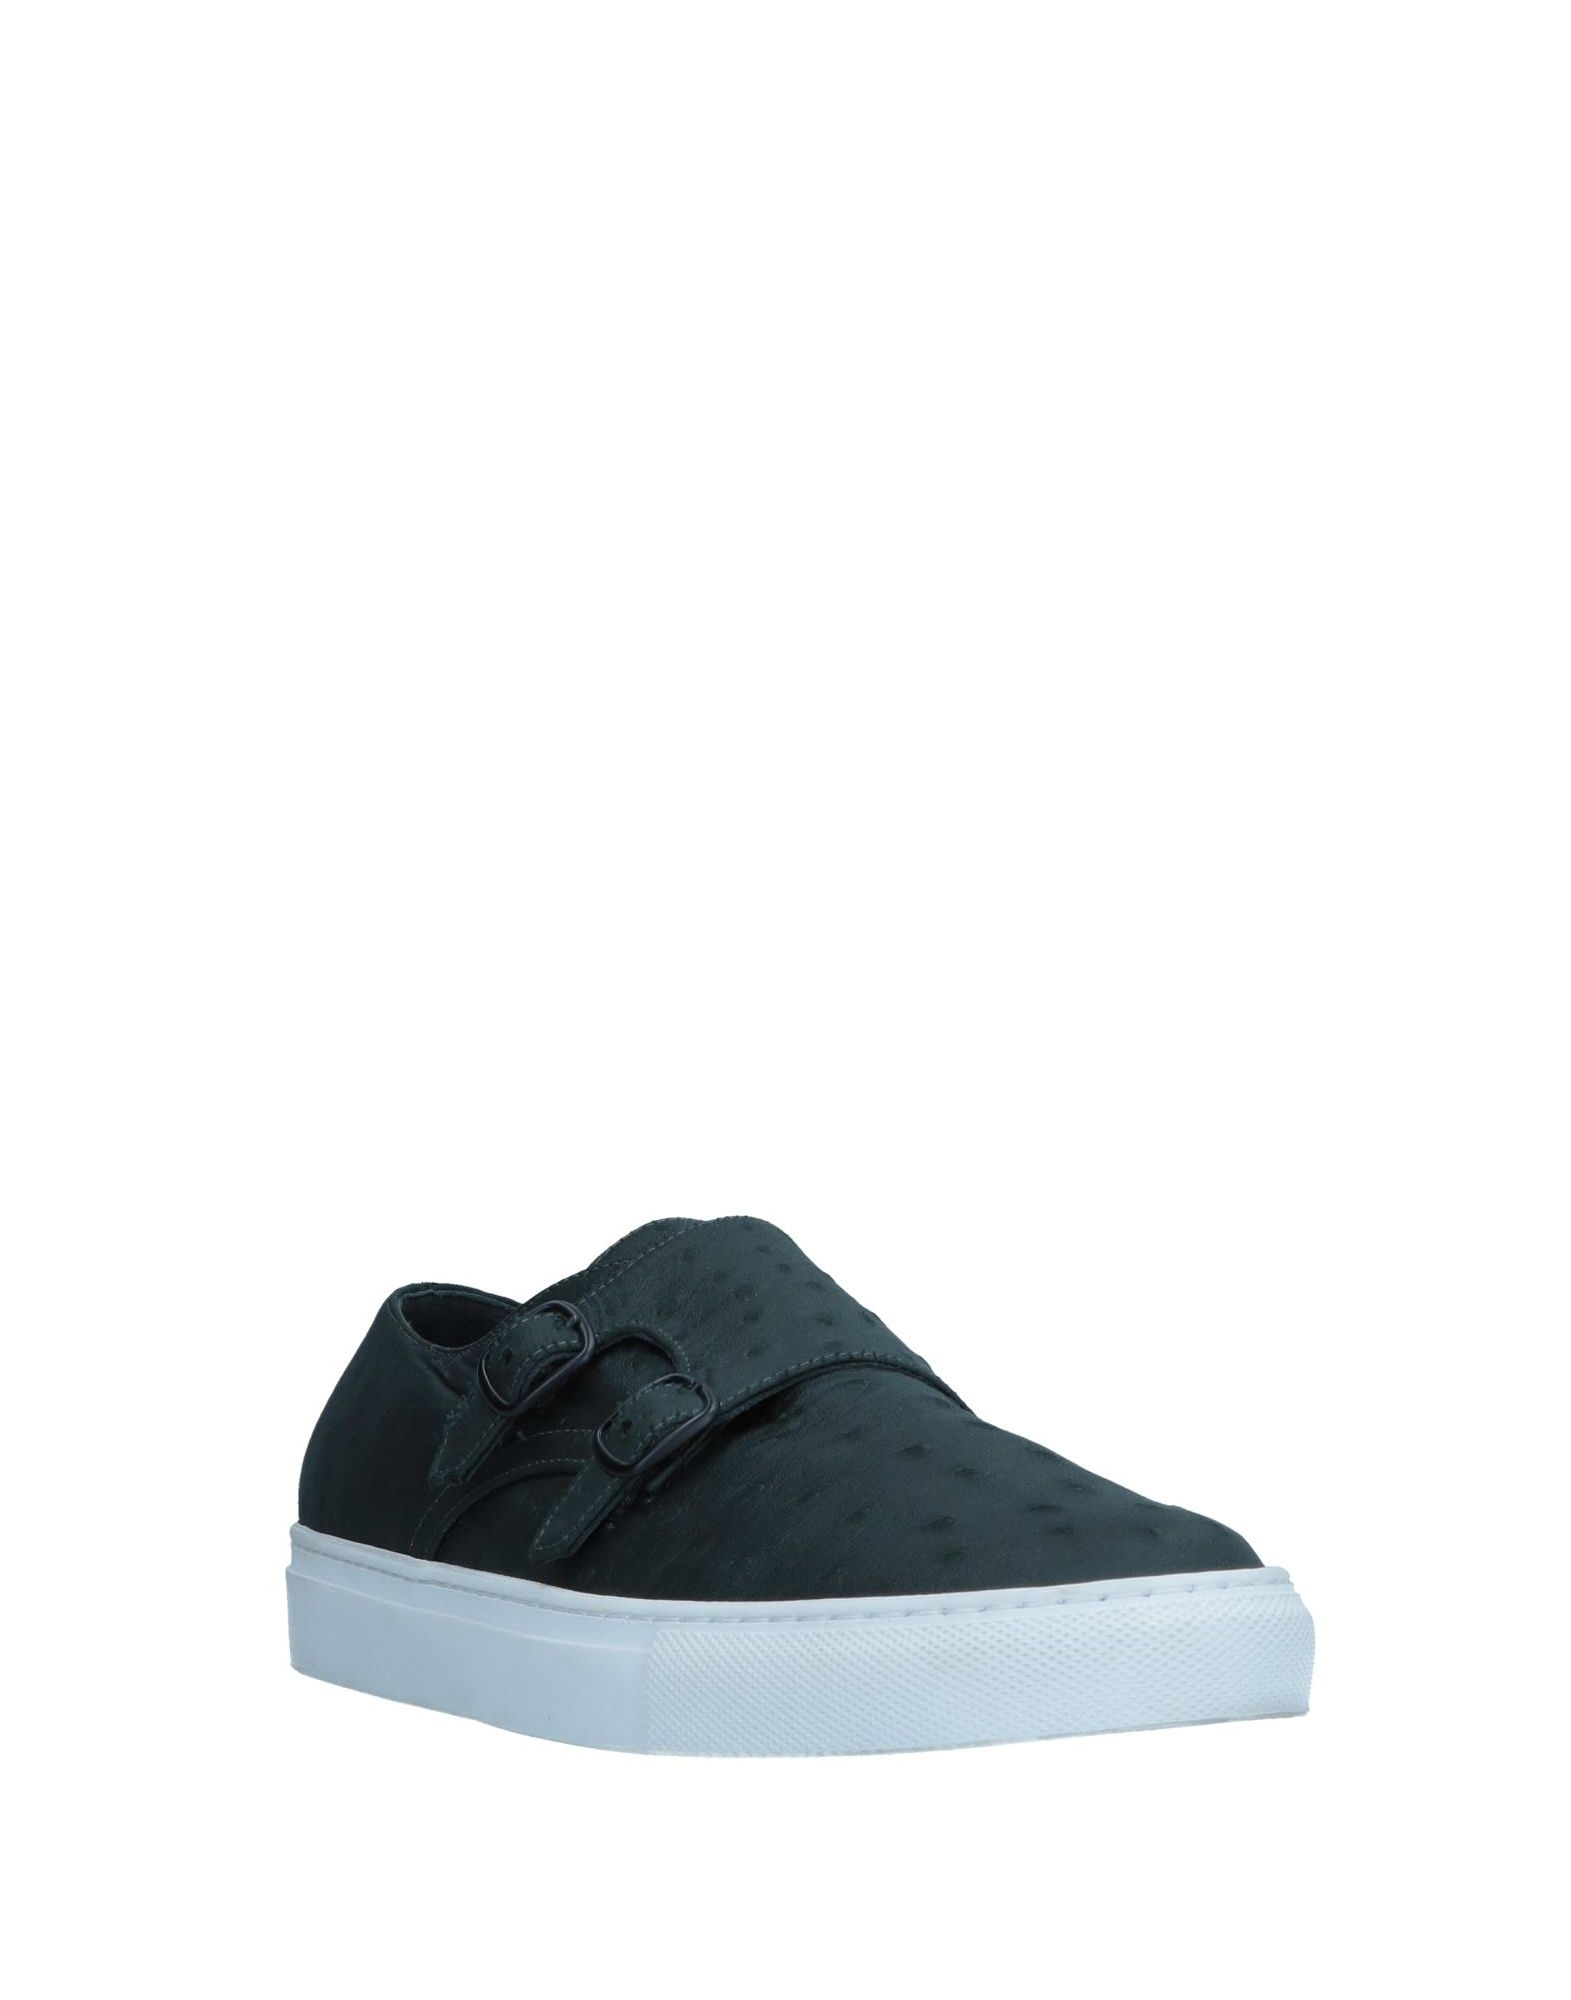 Stilvolle billige Schuhe Cedric 11543657LS Charlier Sneakers Damen  11543657LS Cedric 526b02